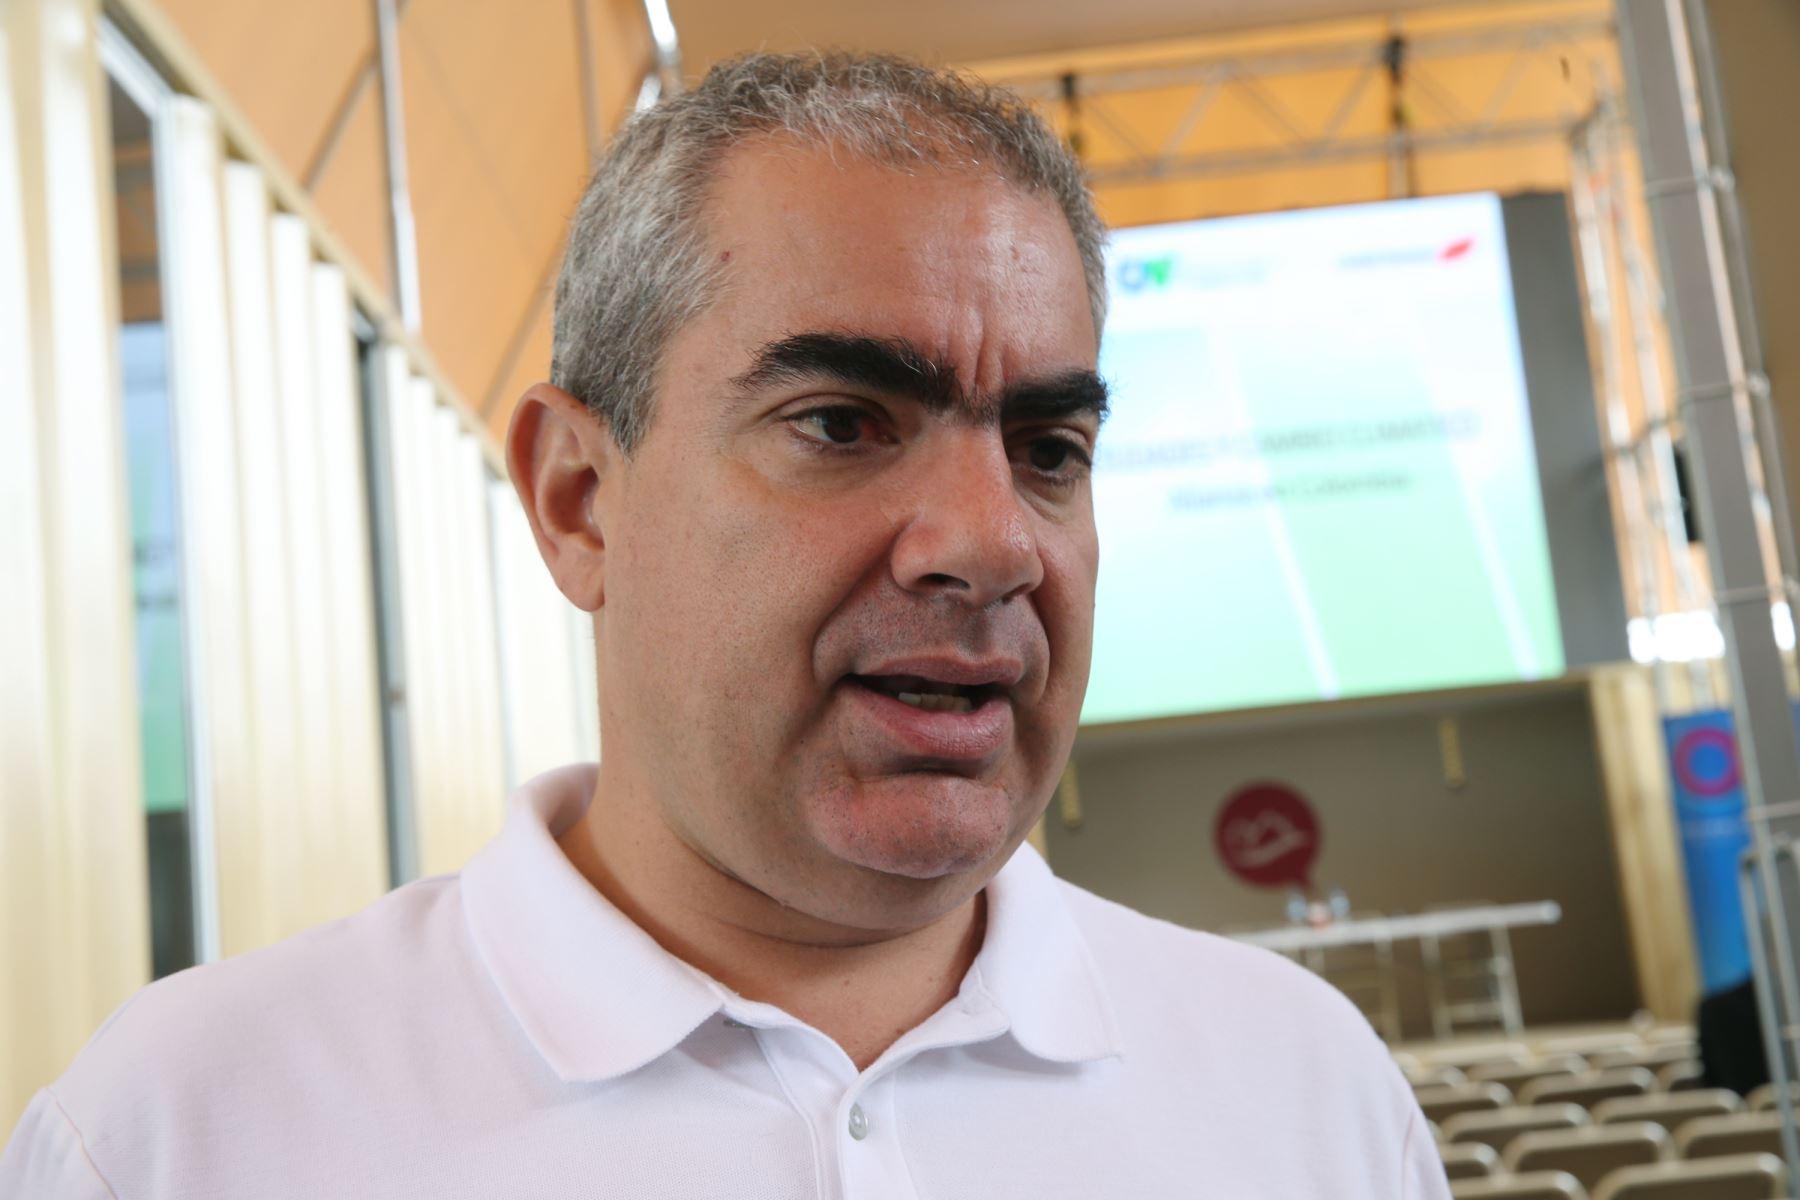 Alcalde de San Isidro Manuel Velarde. Foto: ANDINA/Norman Córdova